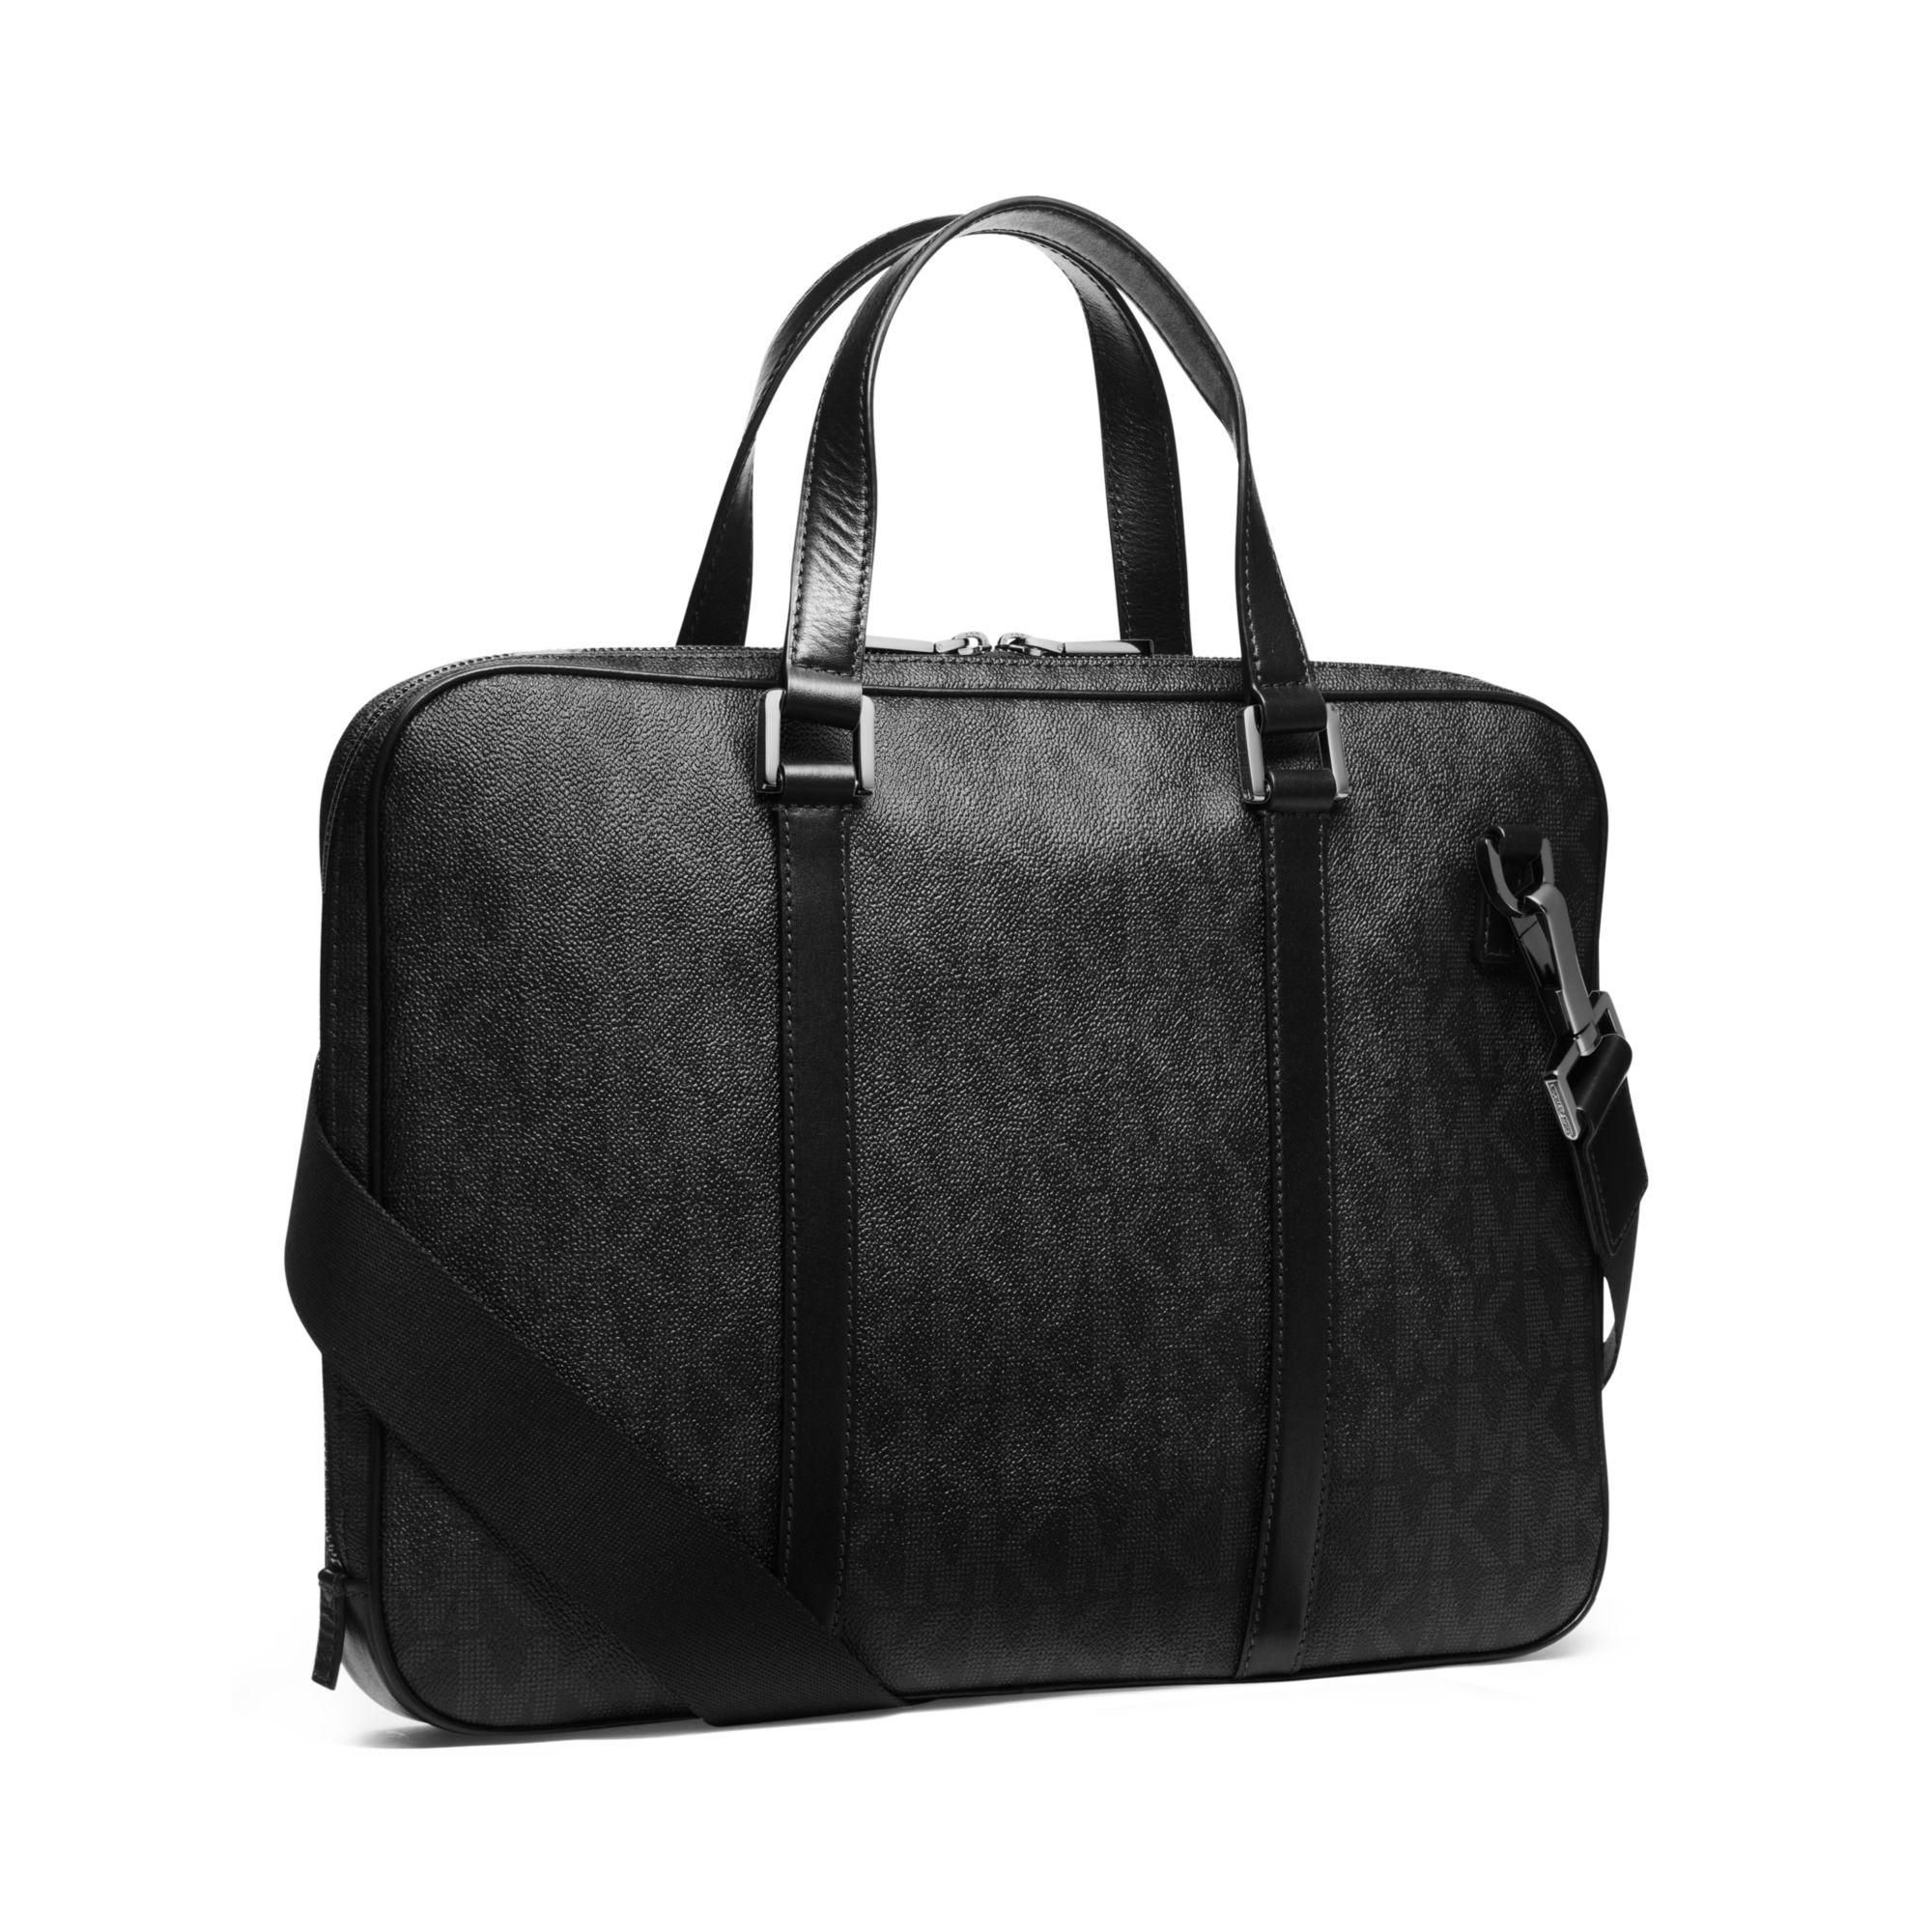 a981eea7fd34 Lyst - Michael Kors Jet Set Men s Logo Briefcase in Black for Men